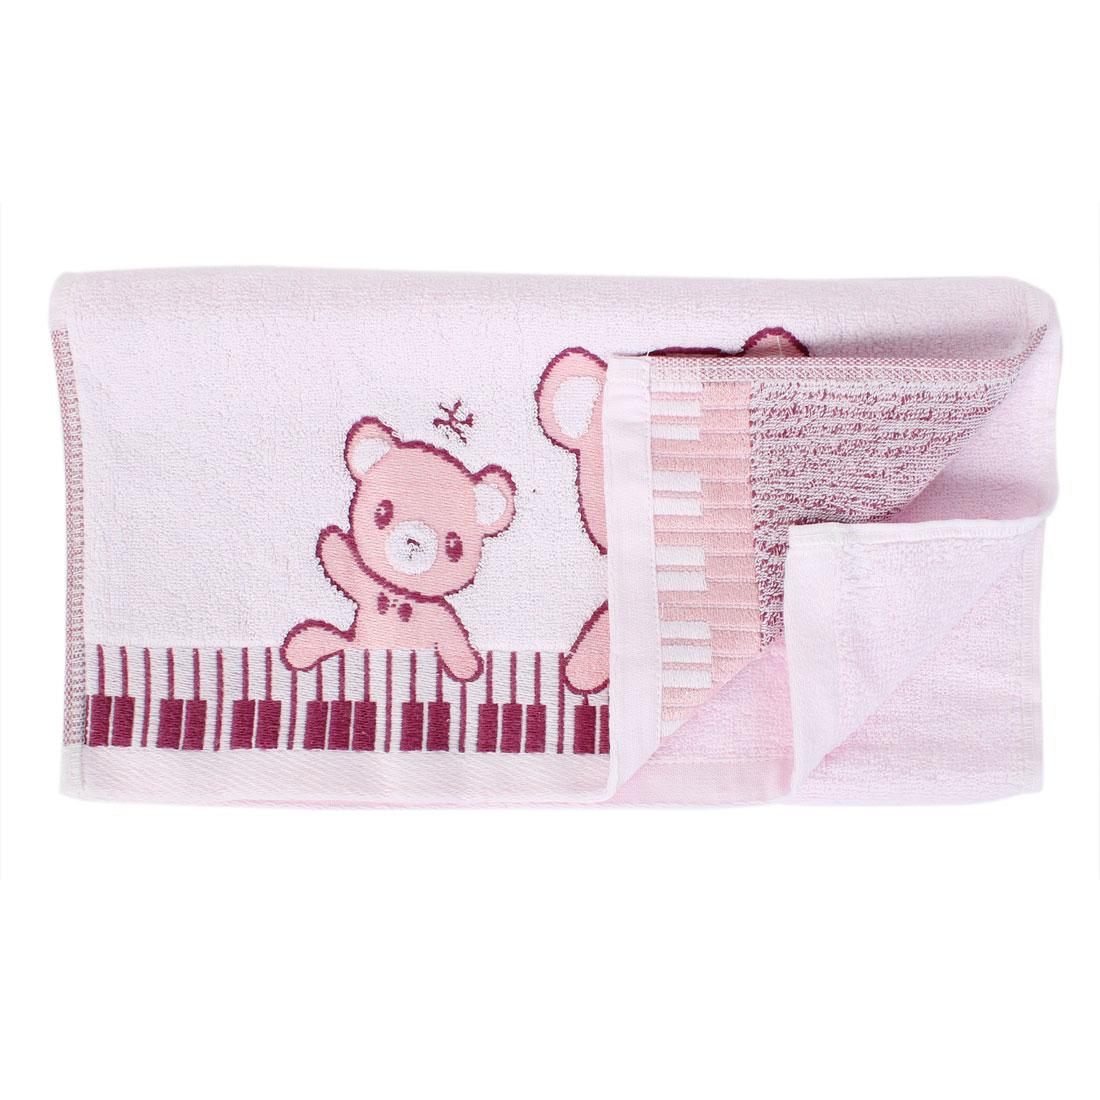 Cotton Blend Bear Printed Water Absorbent Shower Bath Towel 75cm x 34cm